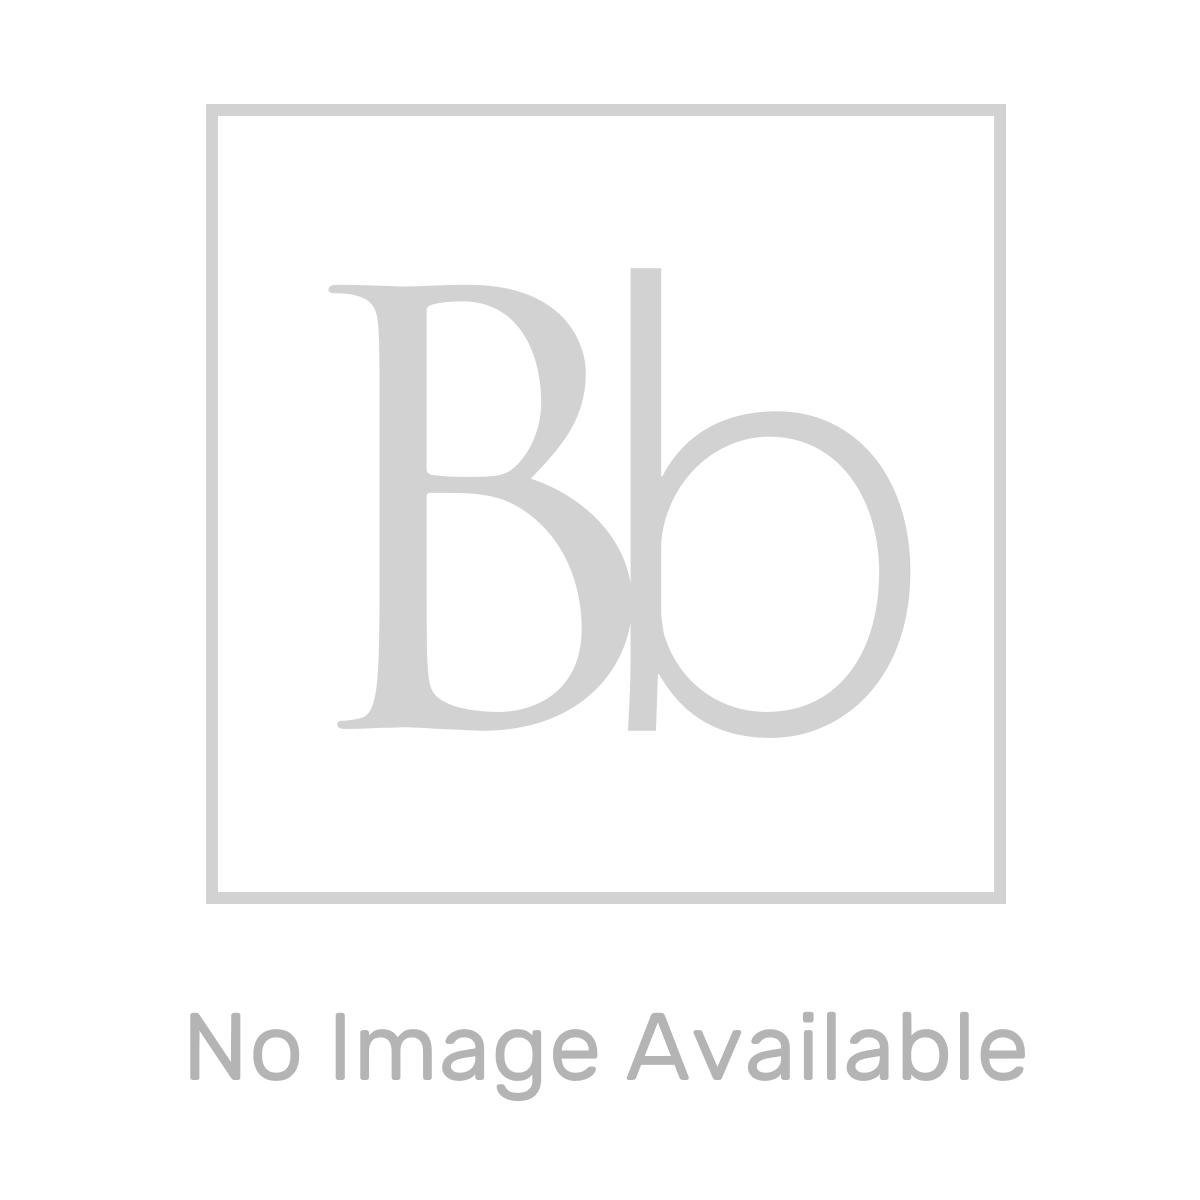 RAK Black Square Shower Handset with Bracket Kit Measurements